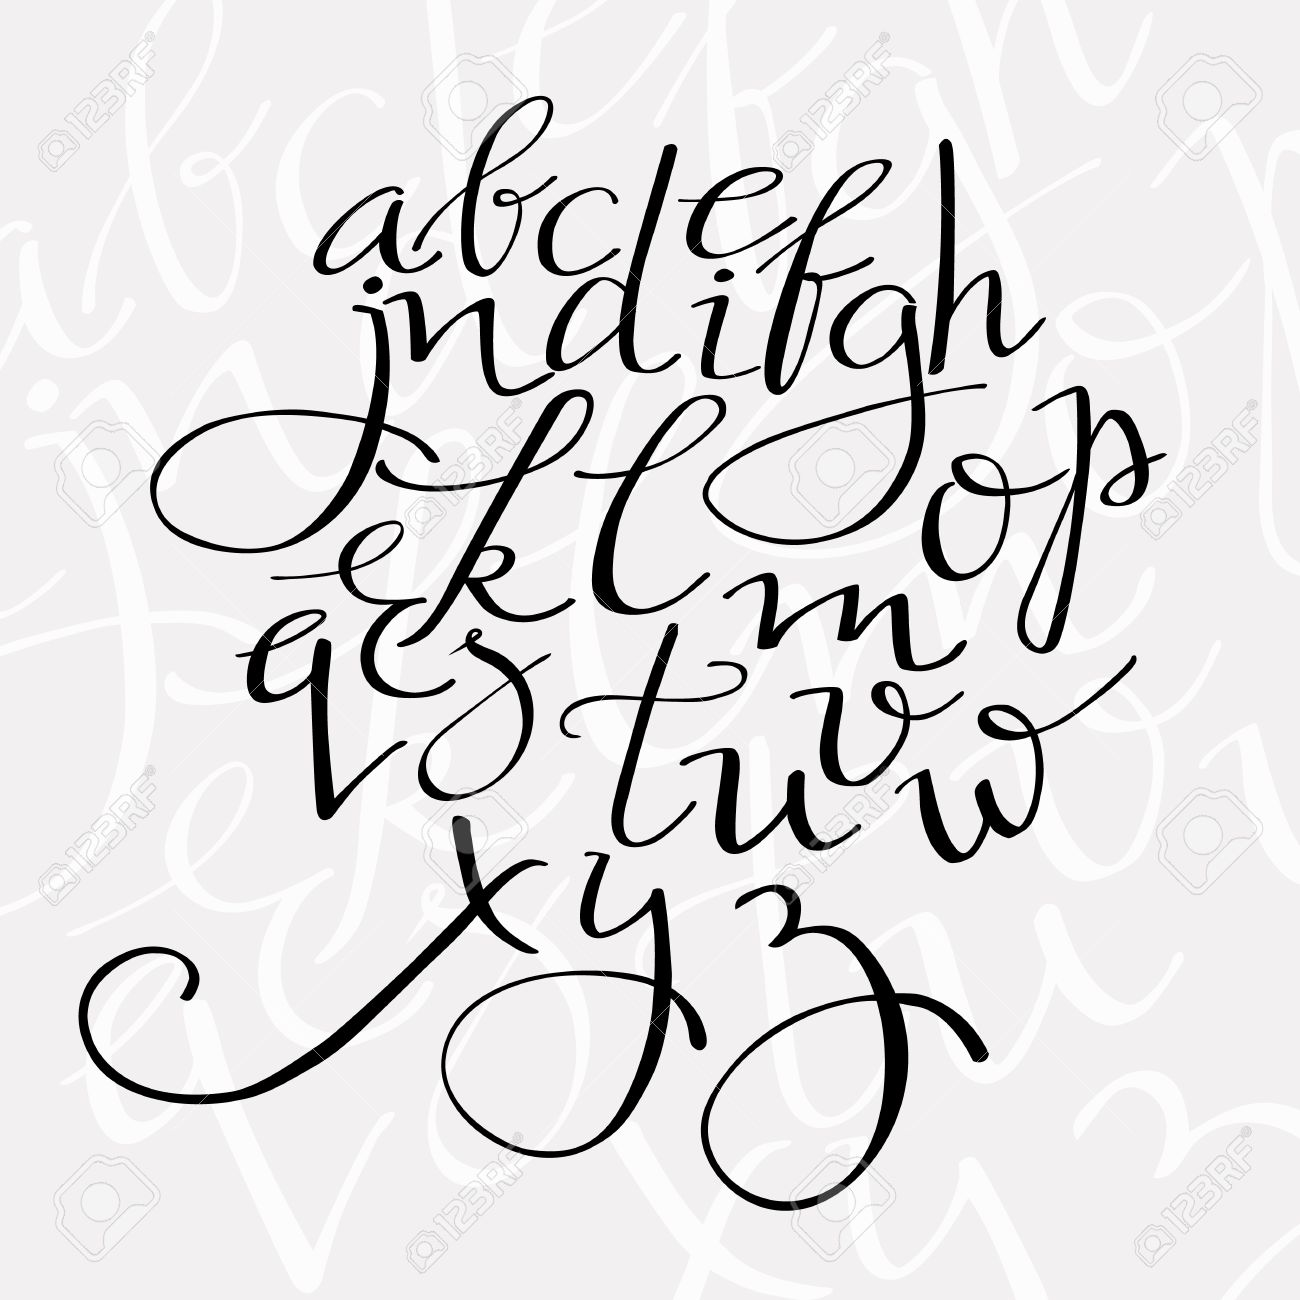 Flourish Script Alphabet Elegant Swirl Font For Menu Or Wedding Invitation Titles Stock Vector